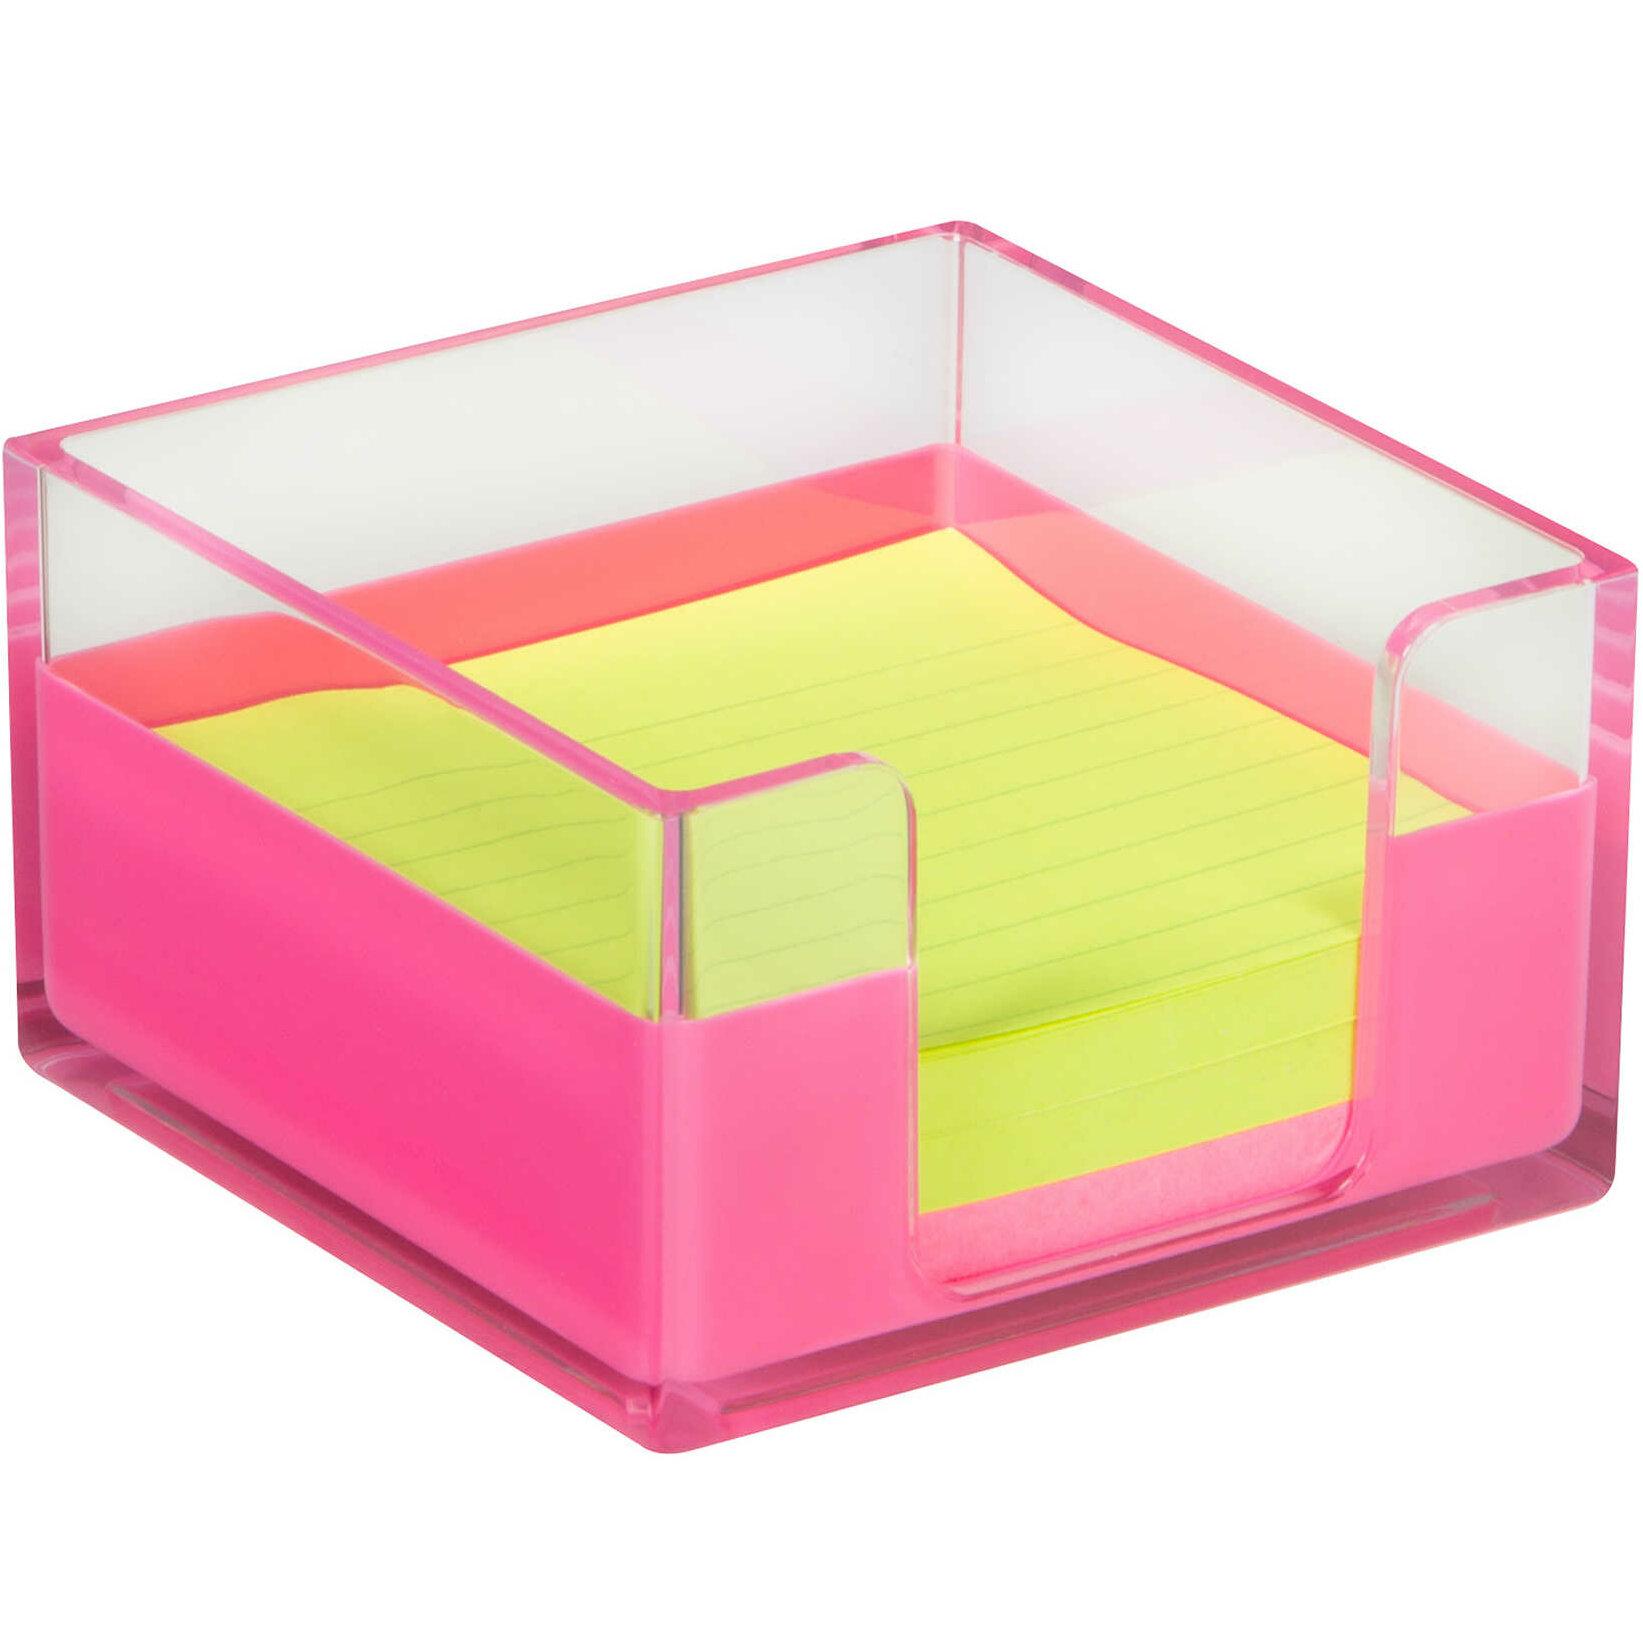 HomeCrate Desk Organizer Memo Tray | Wayfair